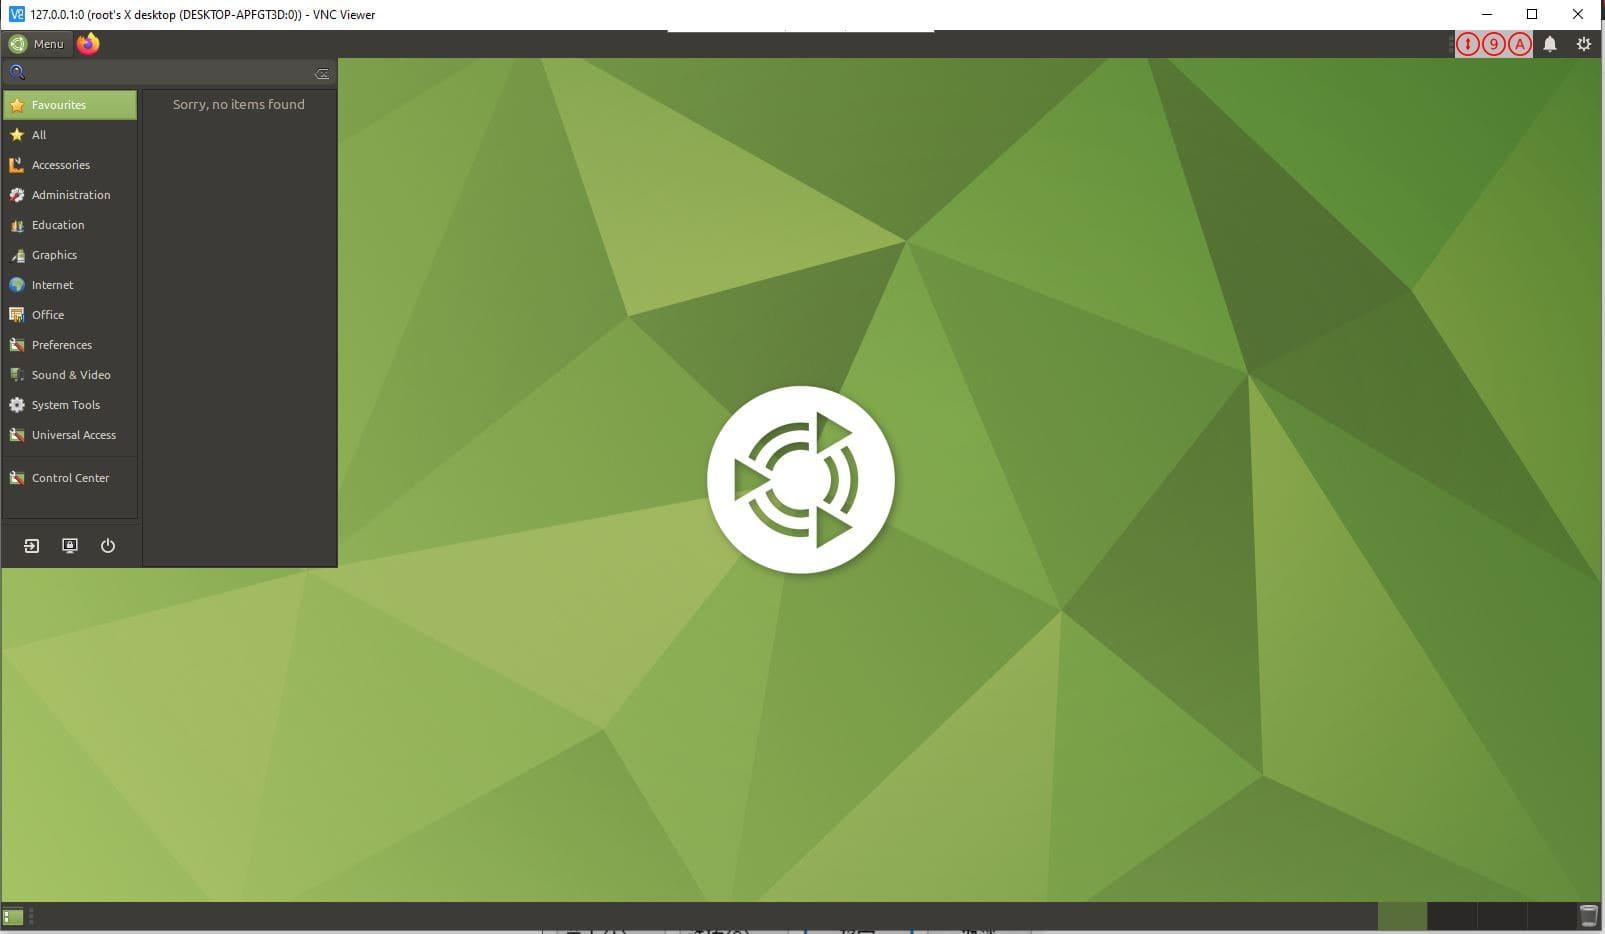 Ubuntu 20.04 LTS WSL with Mate Desktop GUI environment min